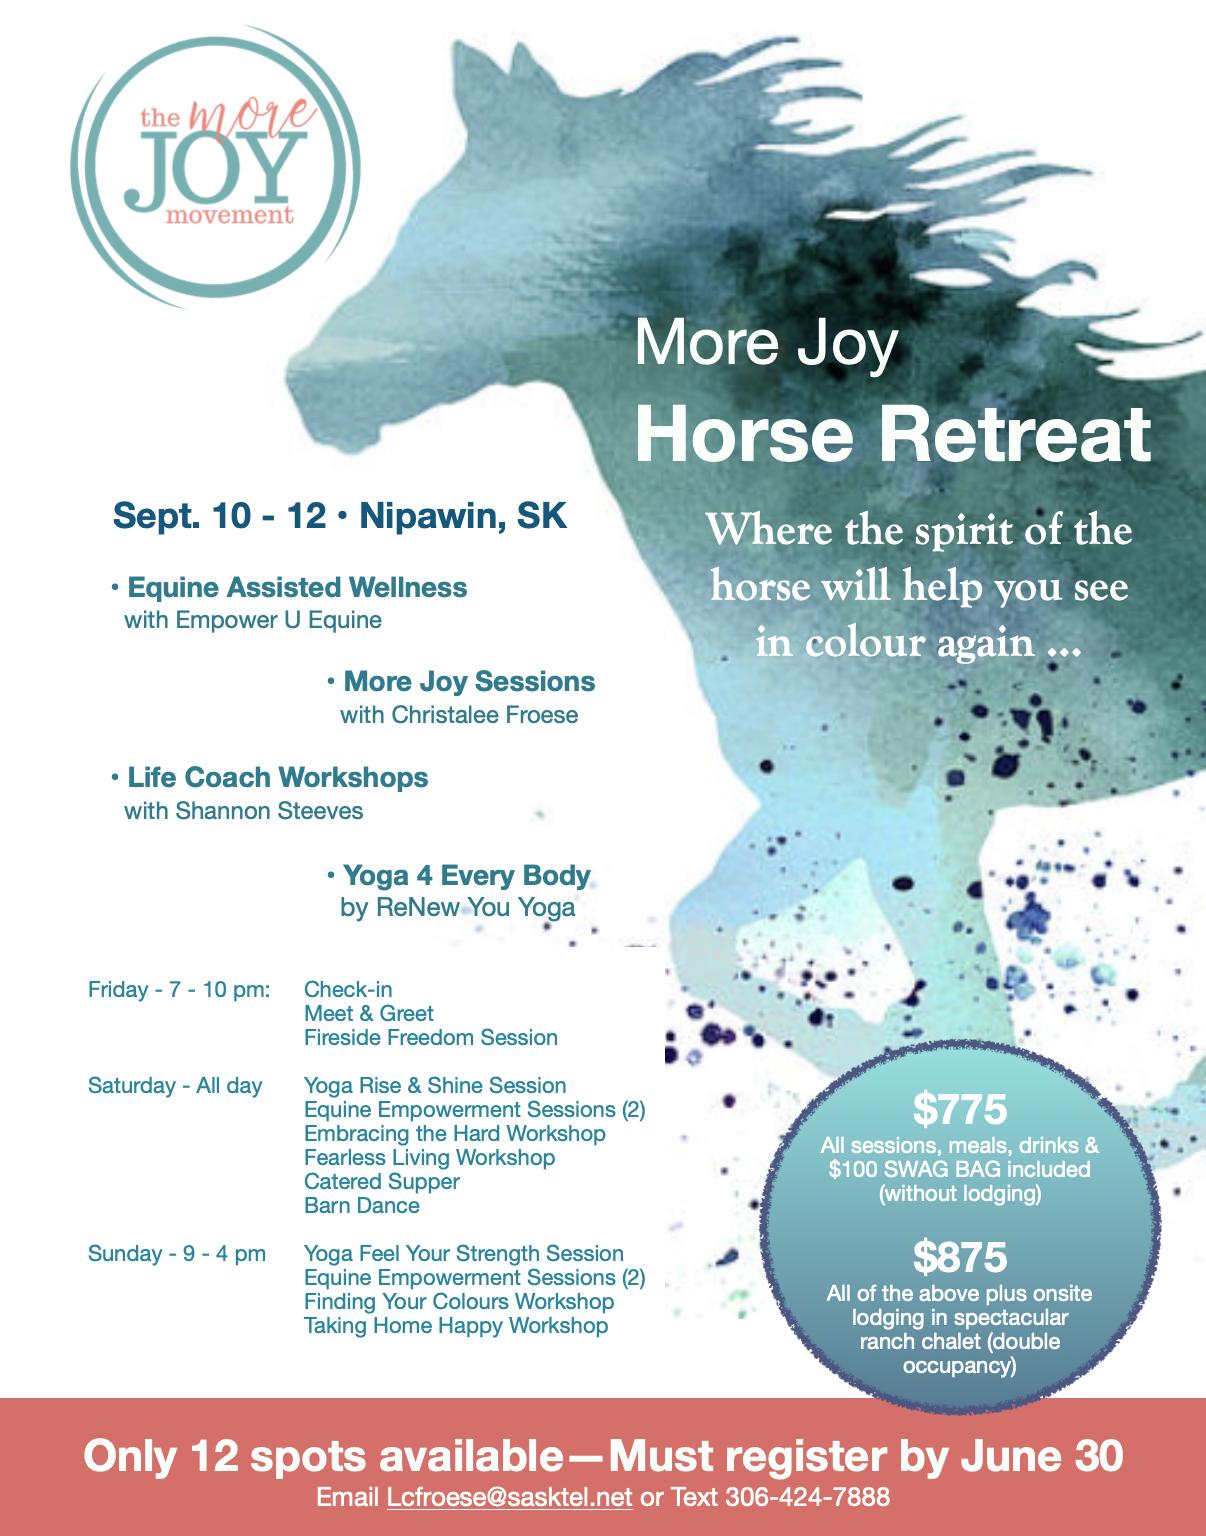 More Joy Horse Retreat Deposit